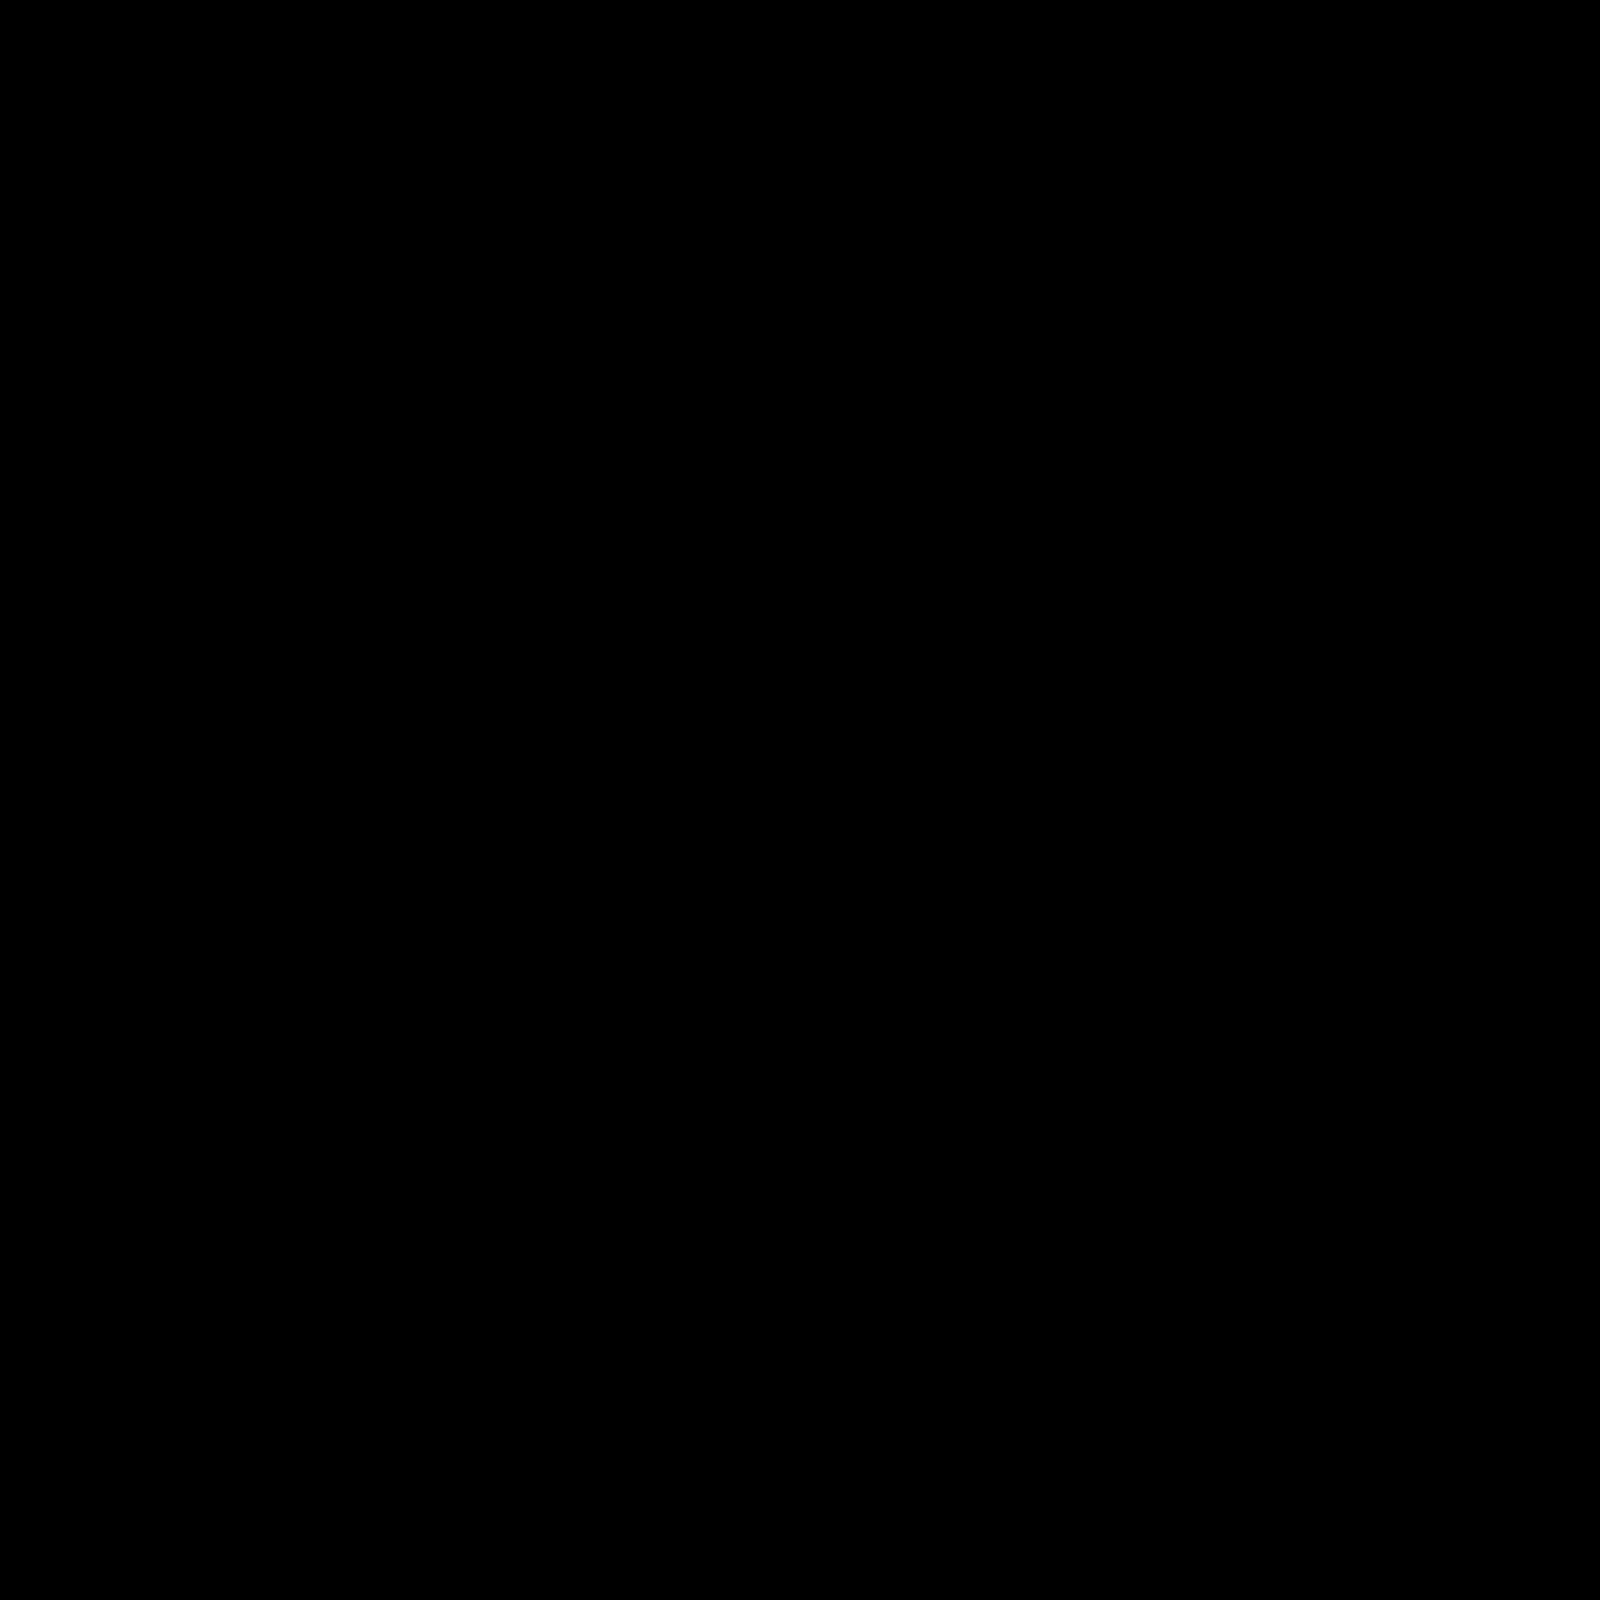 Akta icon